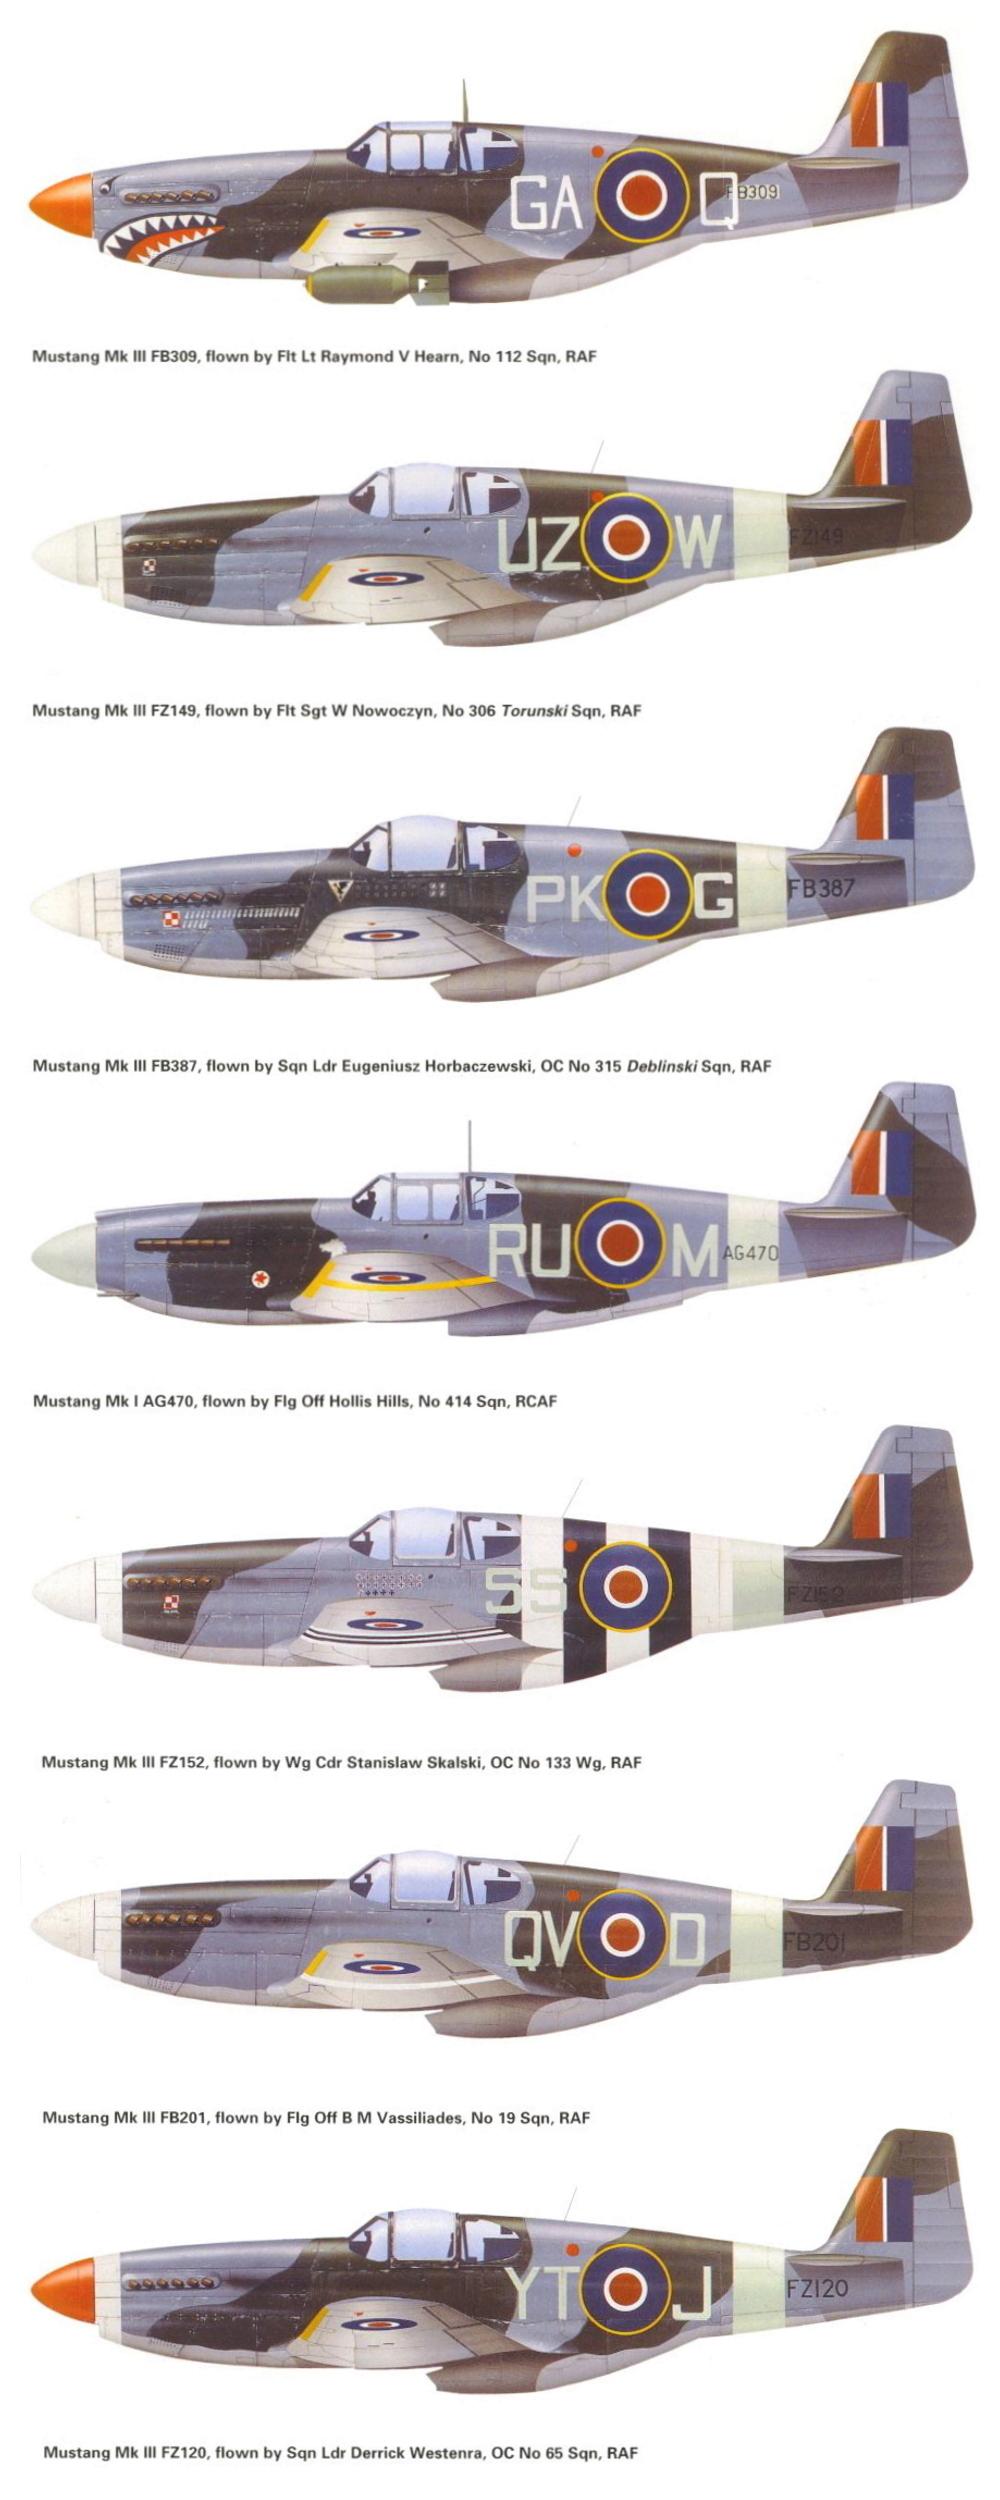 NORTH AMERICAN P-51 MUSTANG P-51-a11